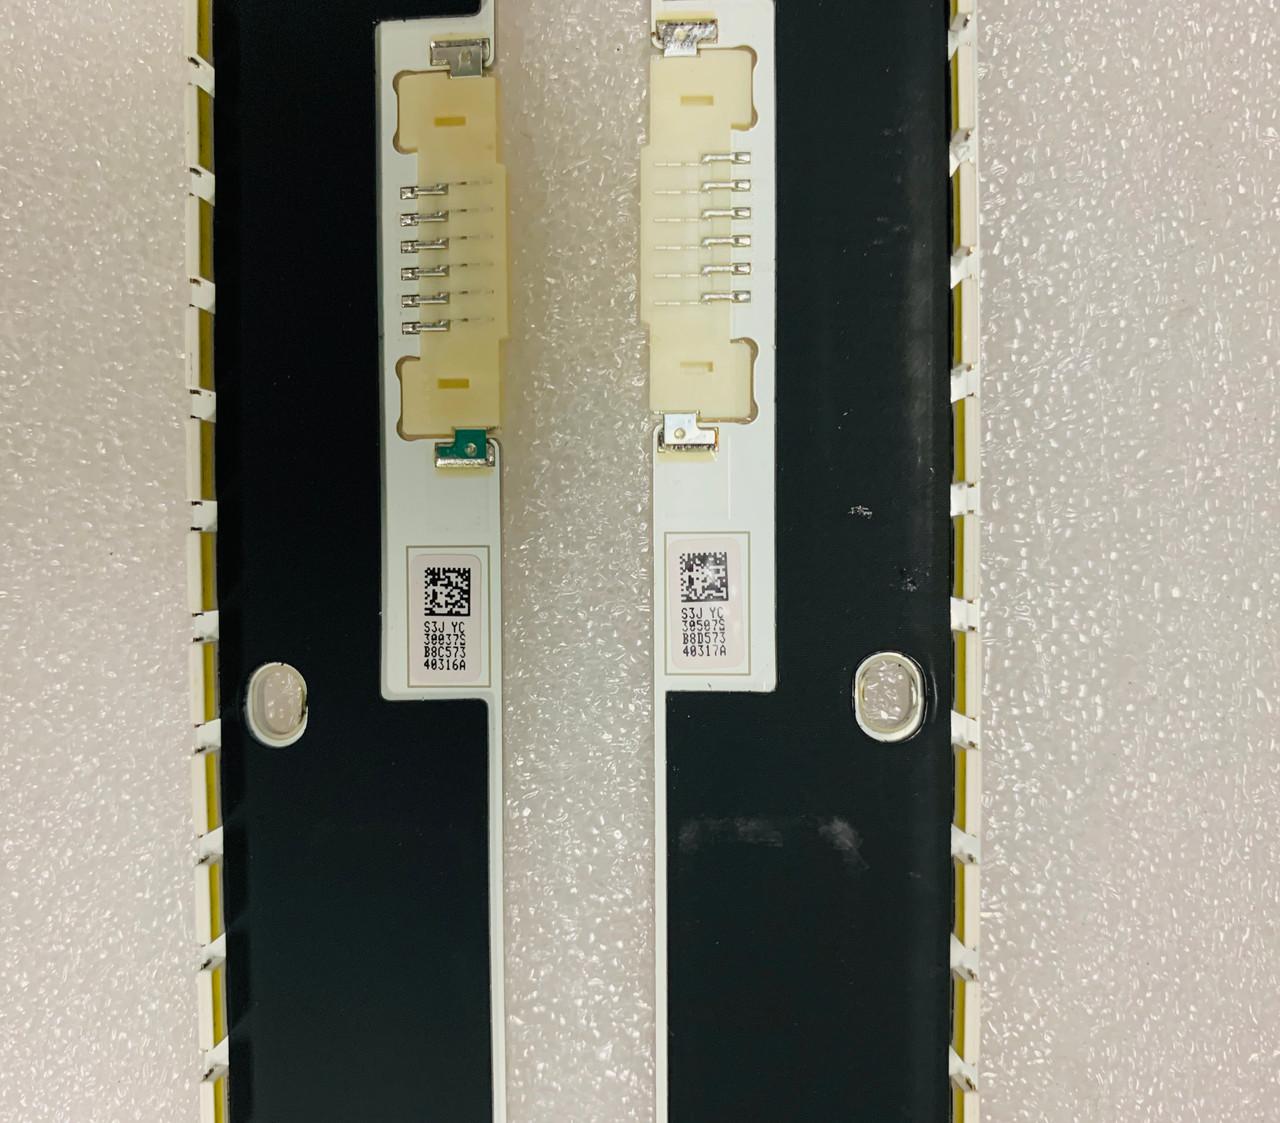 Samsung Original LED Light Strips Complete set in metal bars BN96-40316A & BN96-40317A